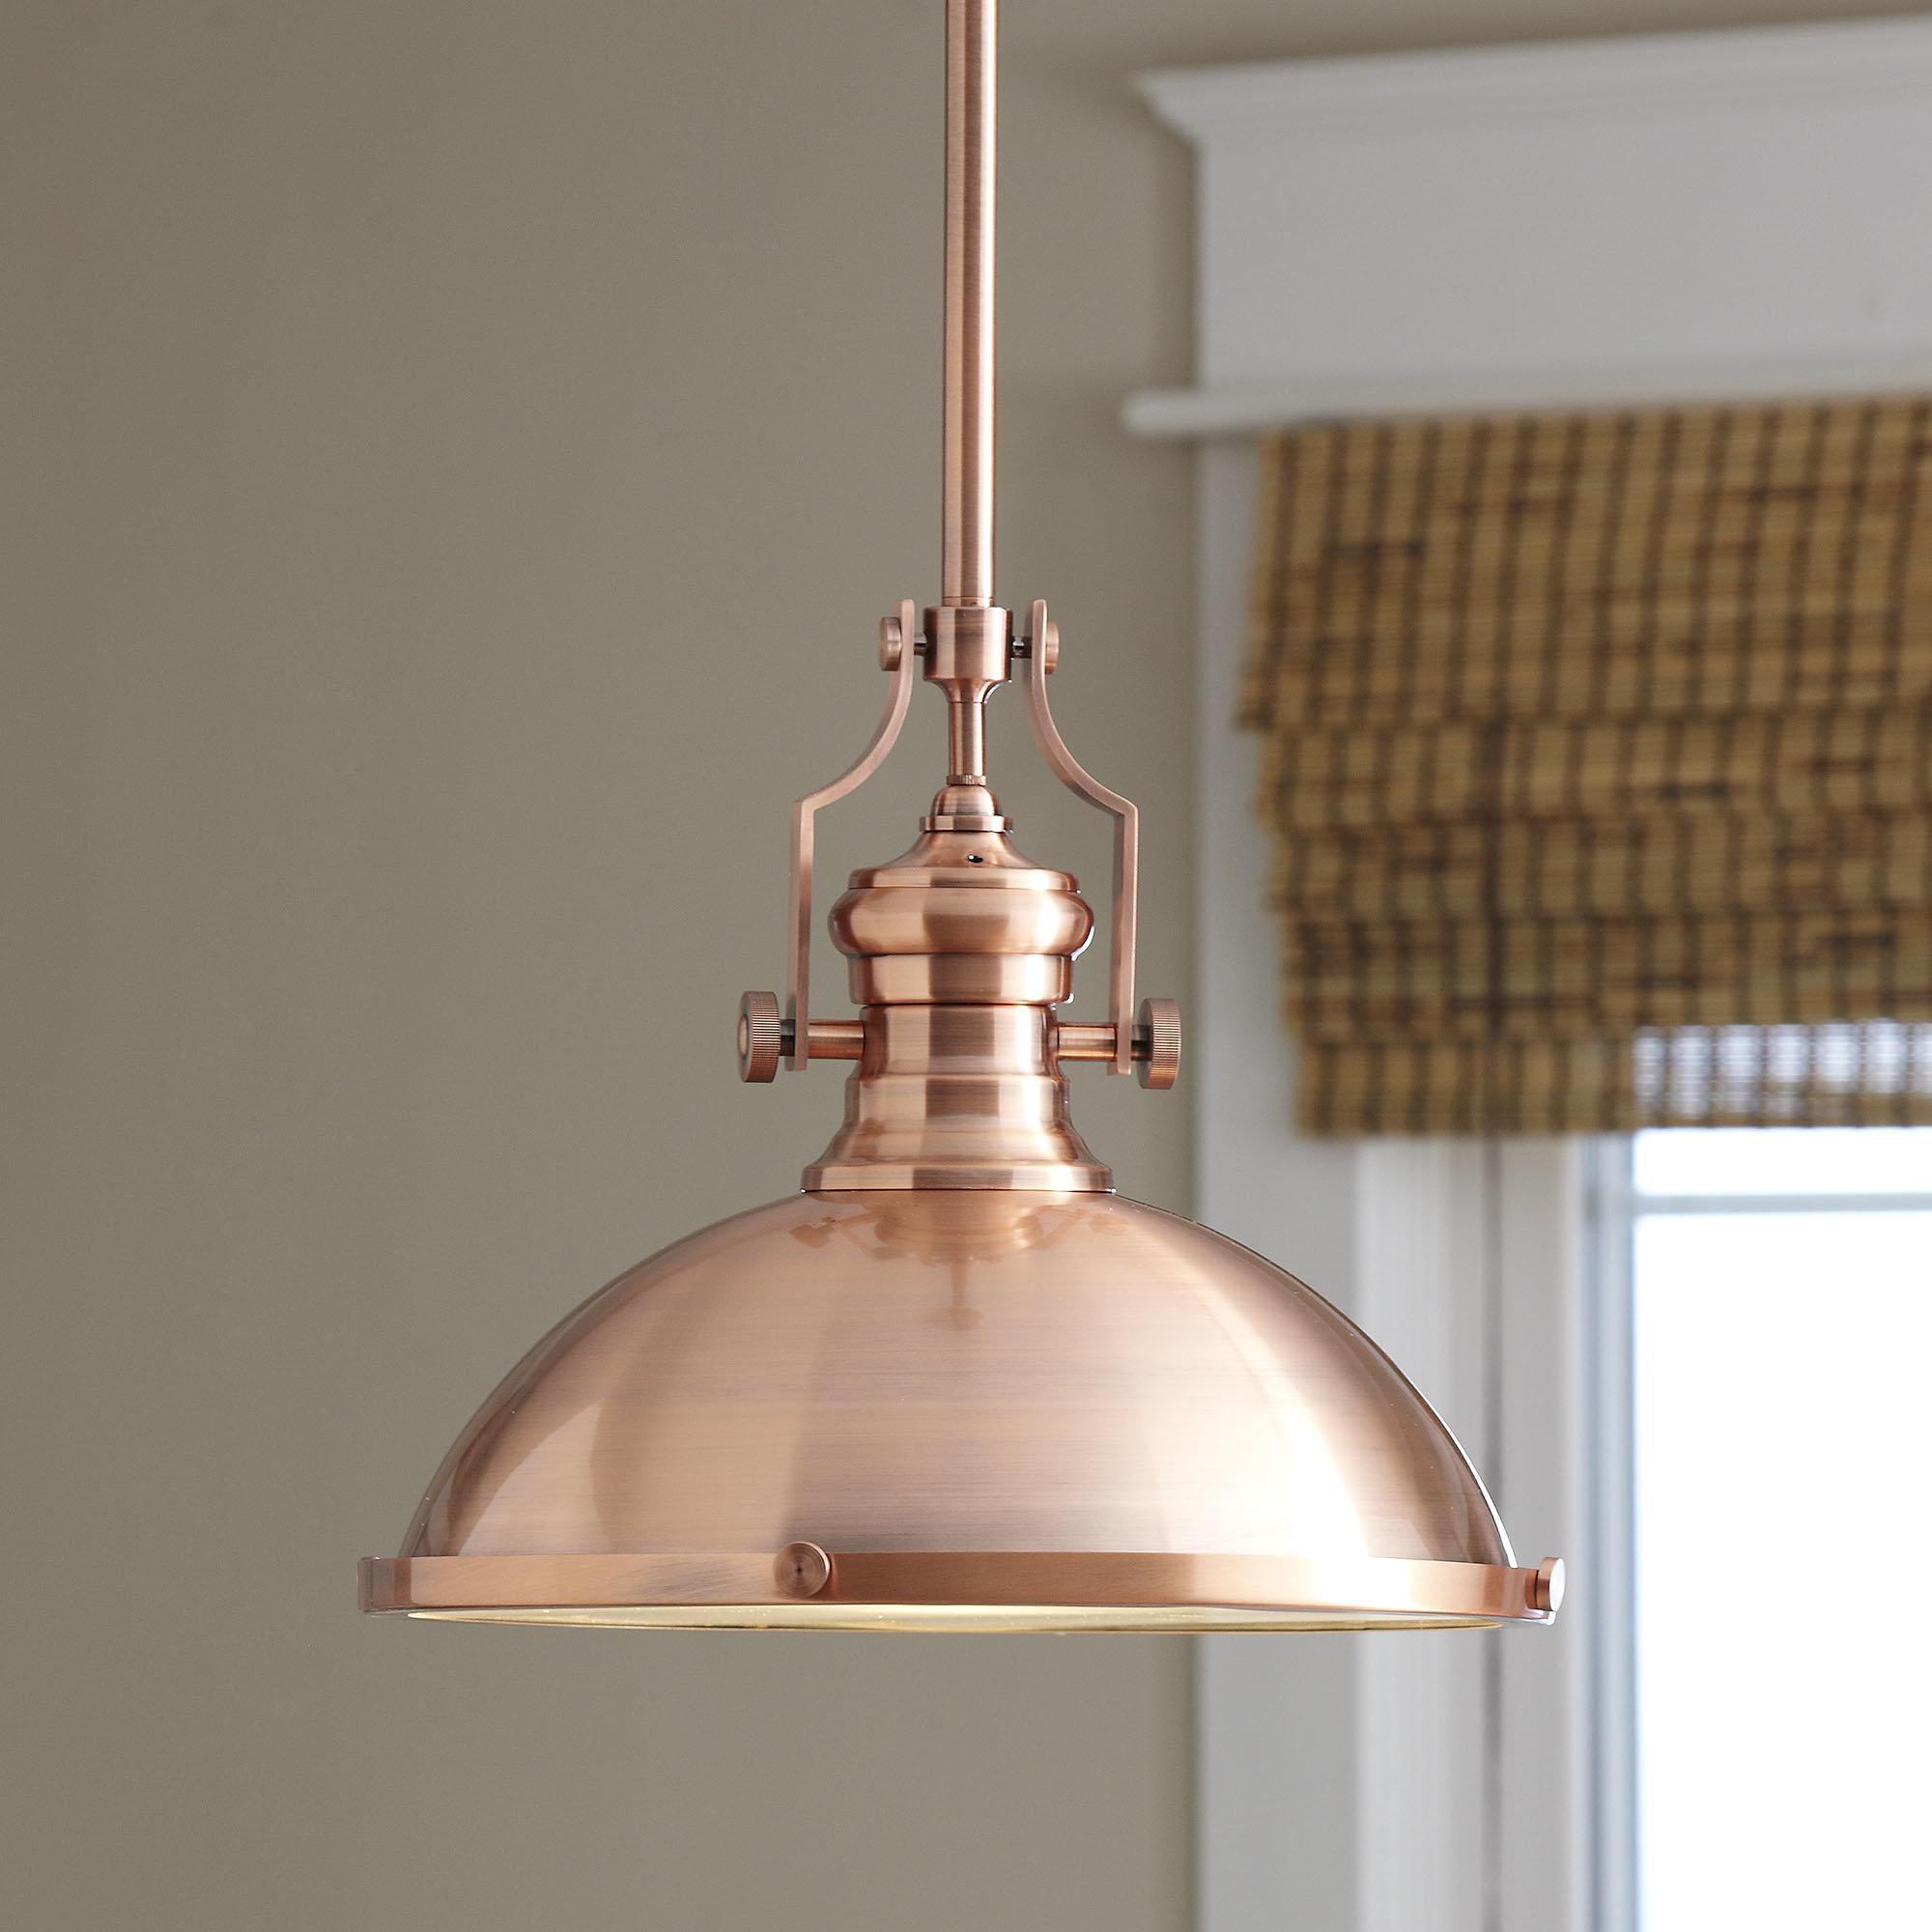 Most Popular Freeda 1 Light Single Dome Pendants Intended For 1 Light Single Dome Pendant (View 12 of 20)